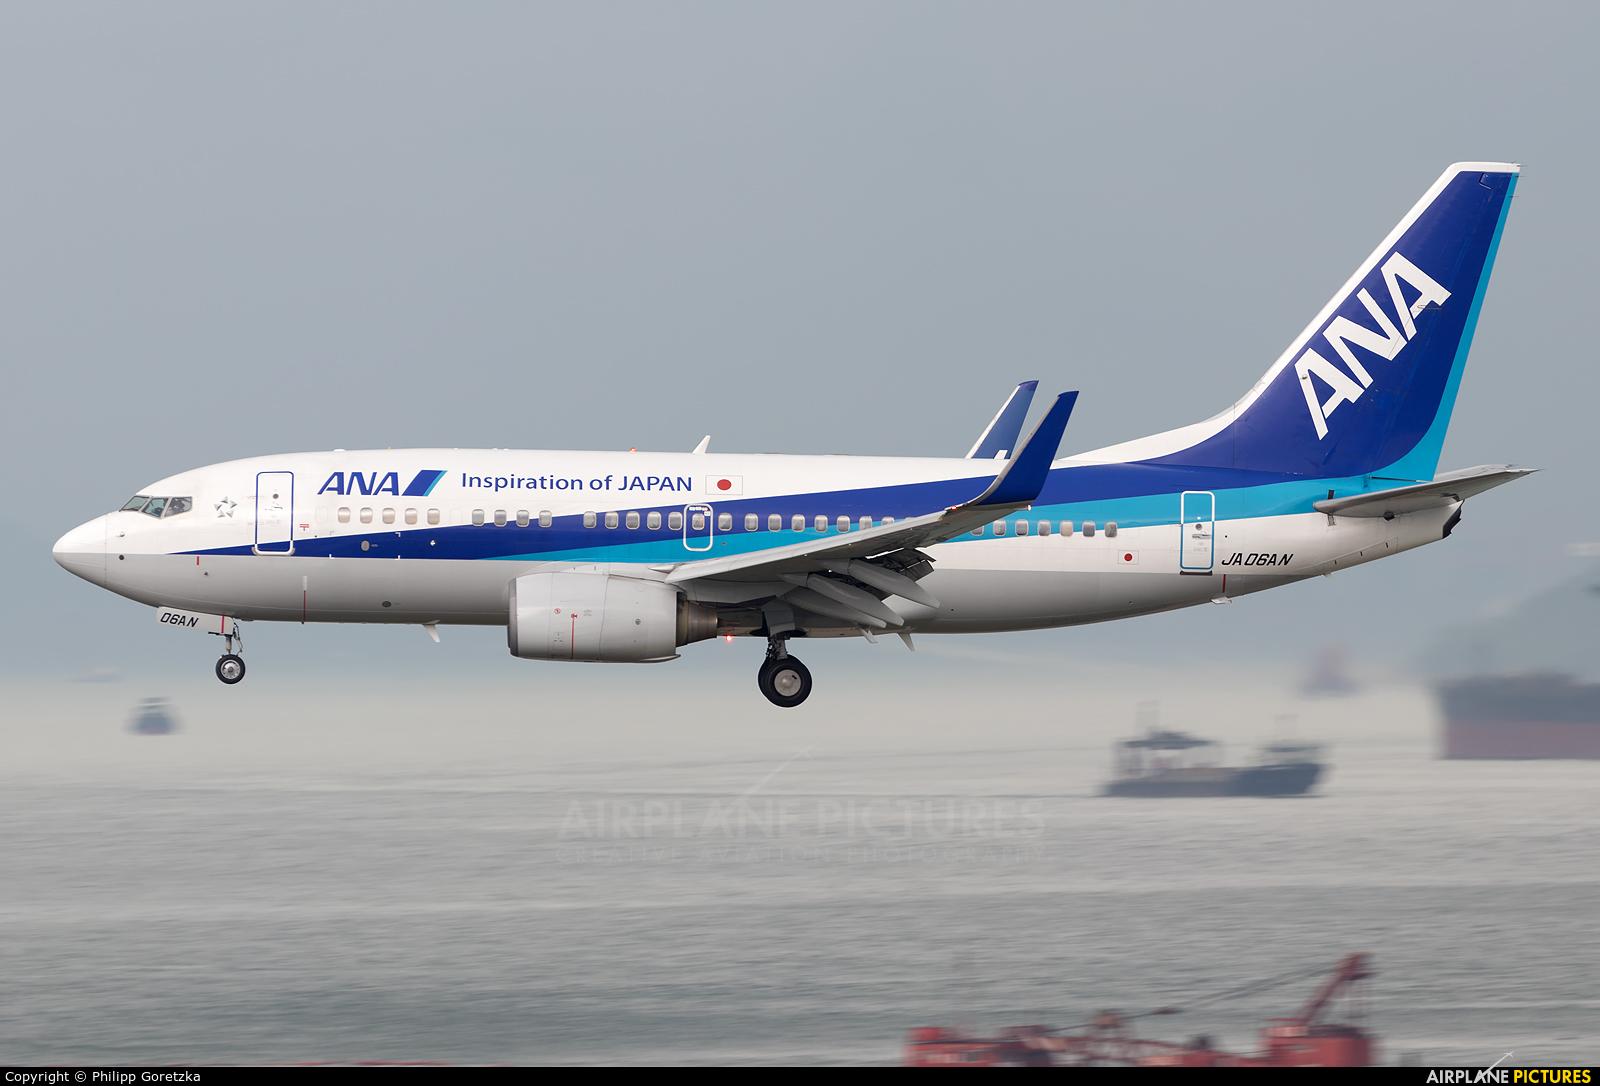 ANA - All Nippon Airways JA06AN aircraft at HKG - Chek Lap Kok Intl